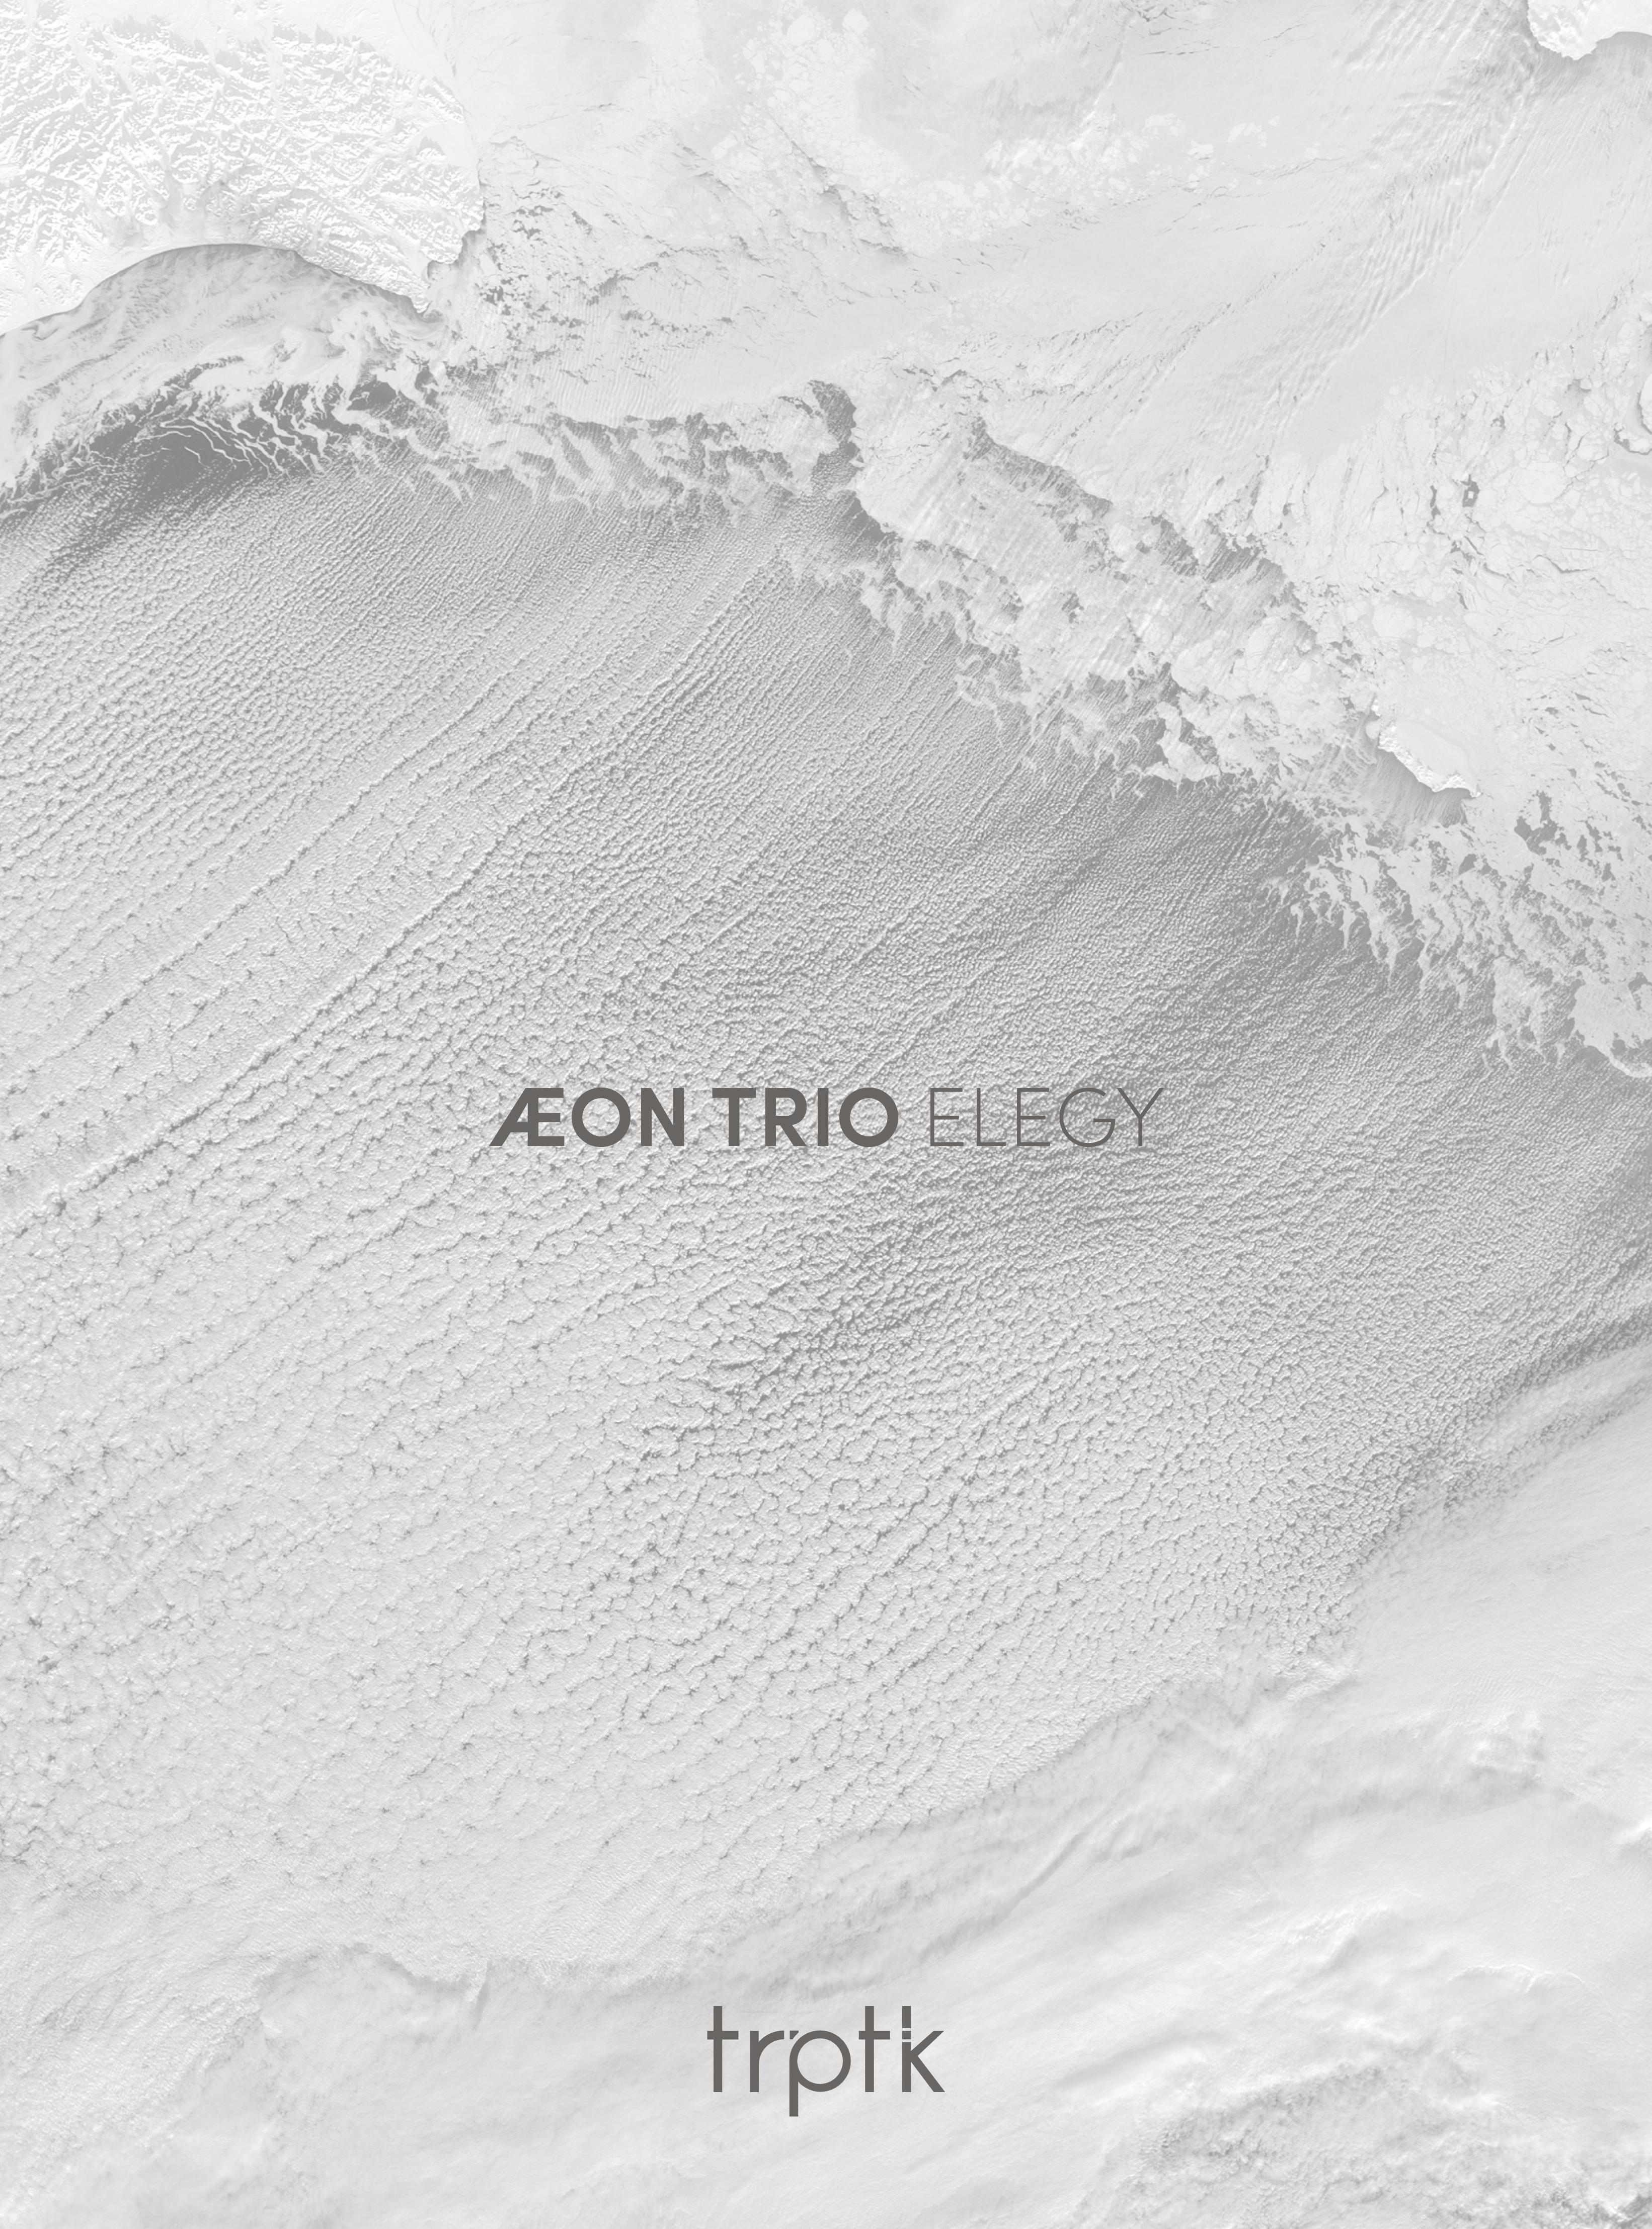 Aeon Trio / Elegy